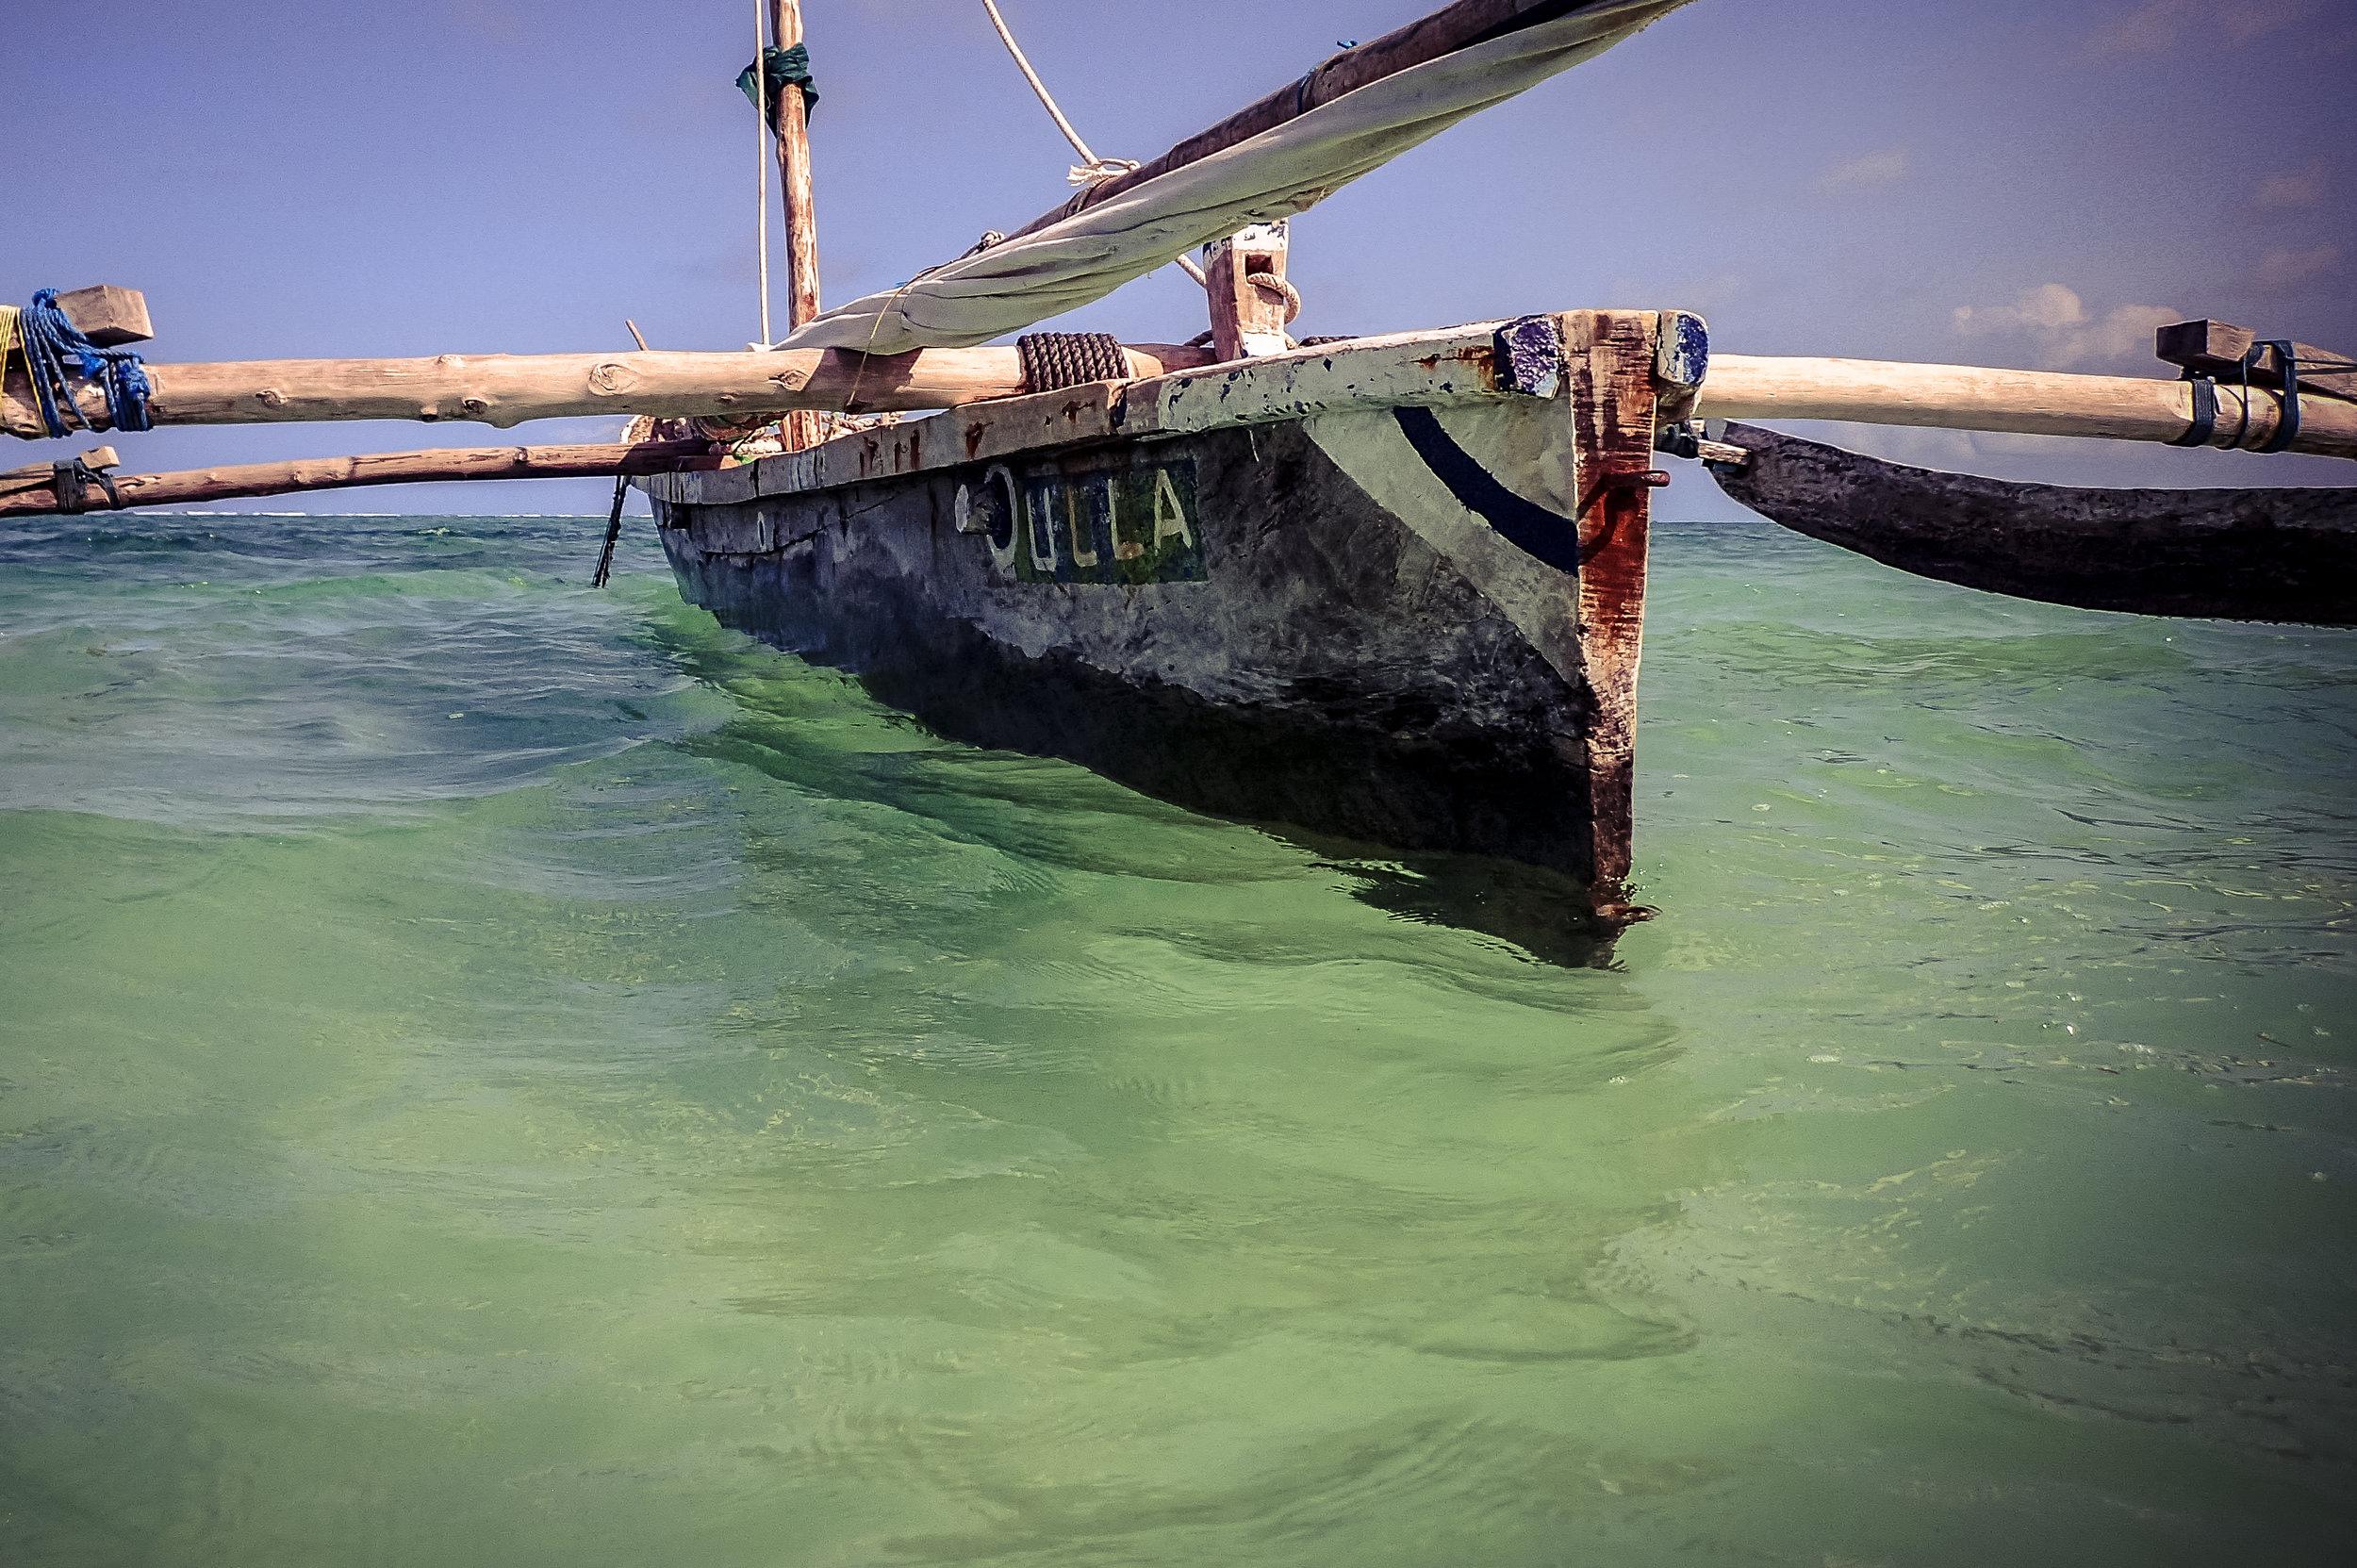 A Zanzibarian dugout canoe. Photo: @ritasteyn